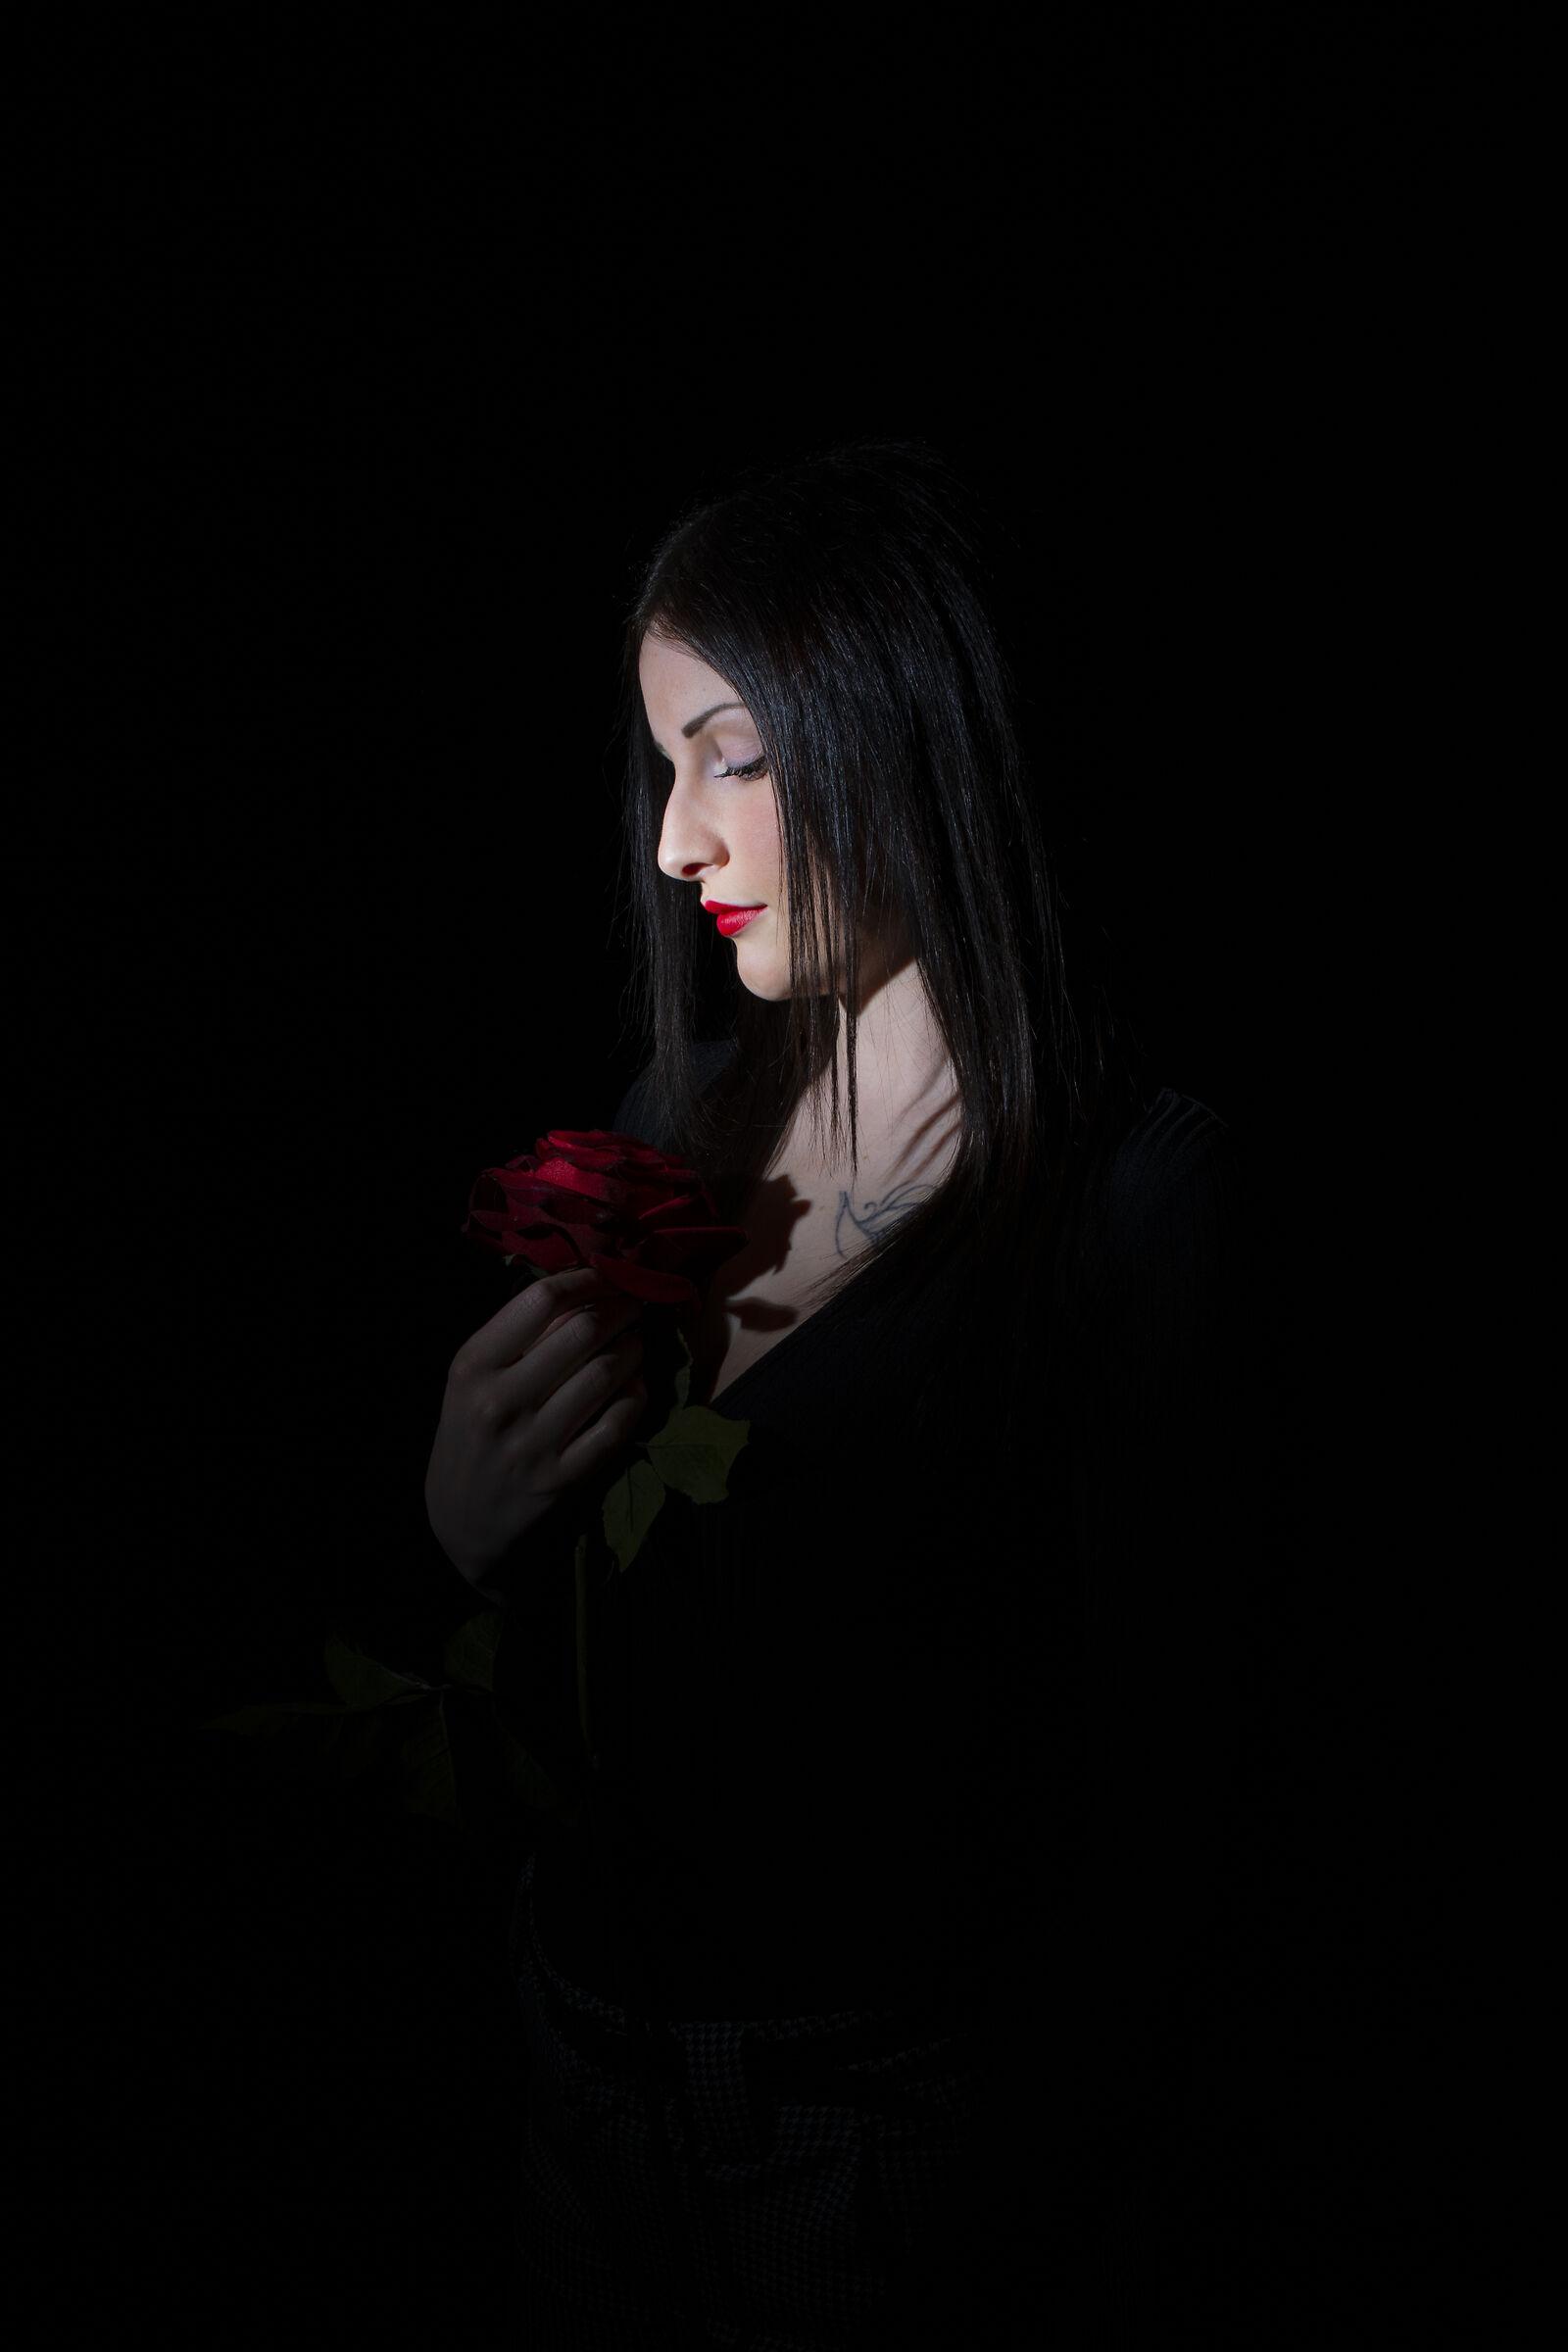 Beauty in the dark...